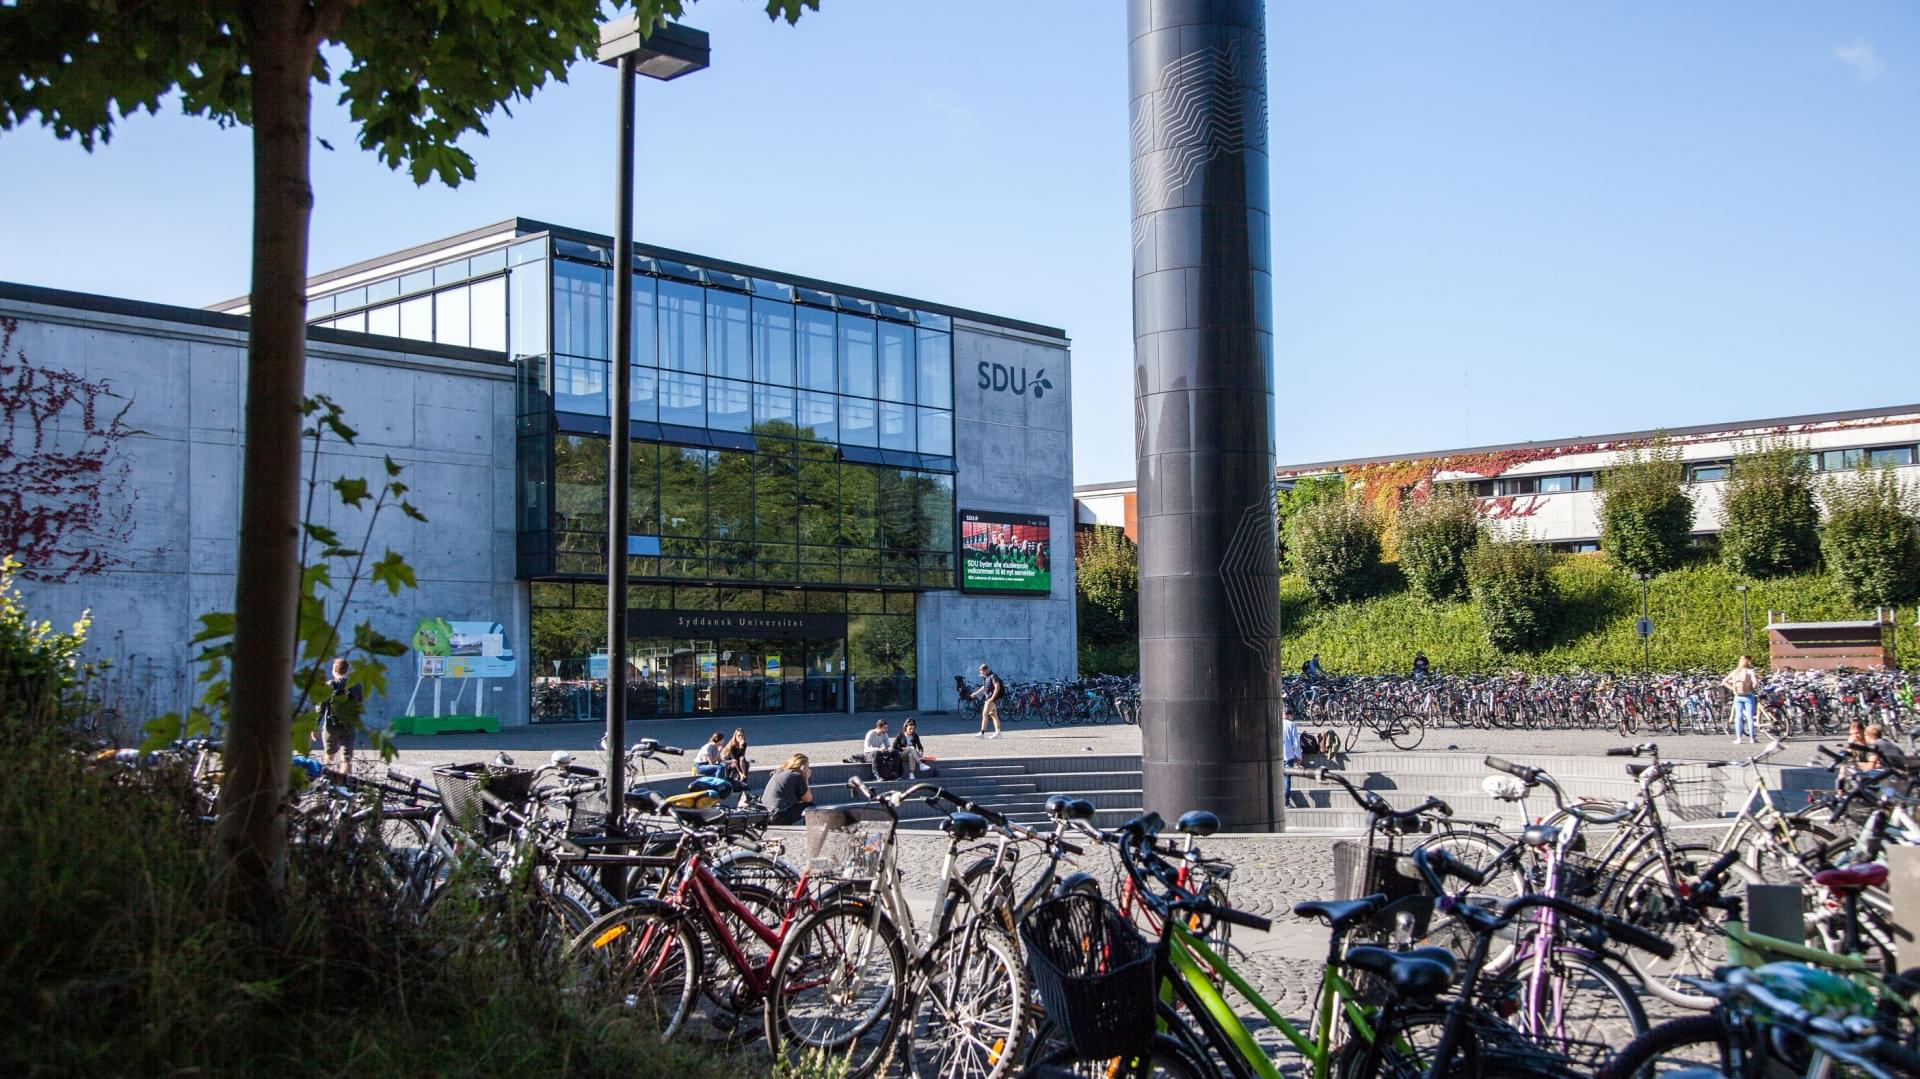 Indgange Sdu Odense Odense Rundt